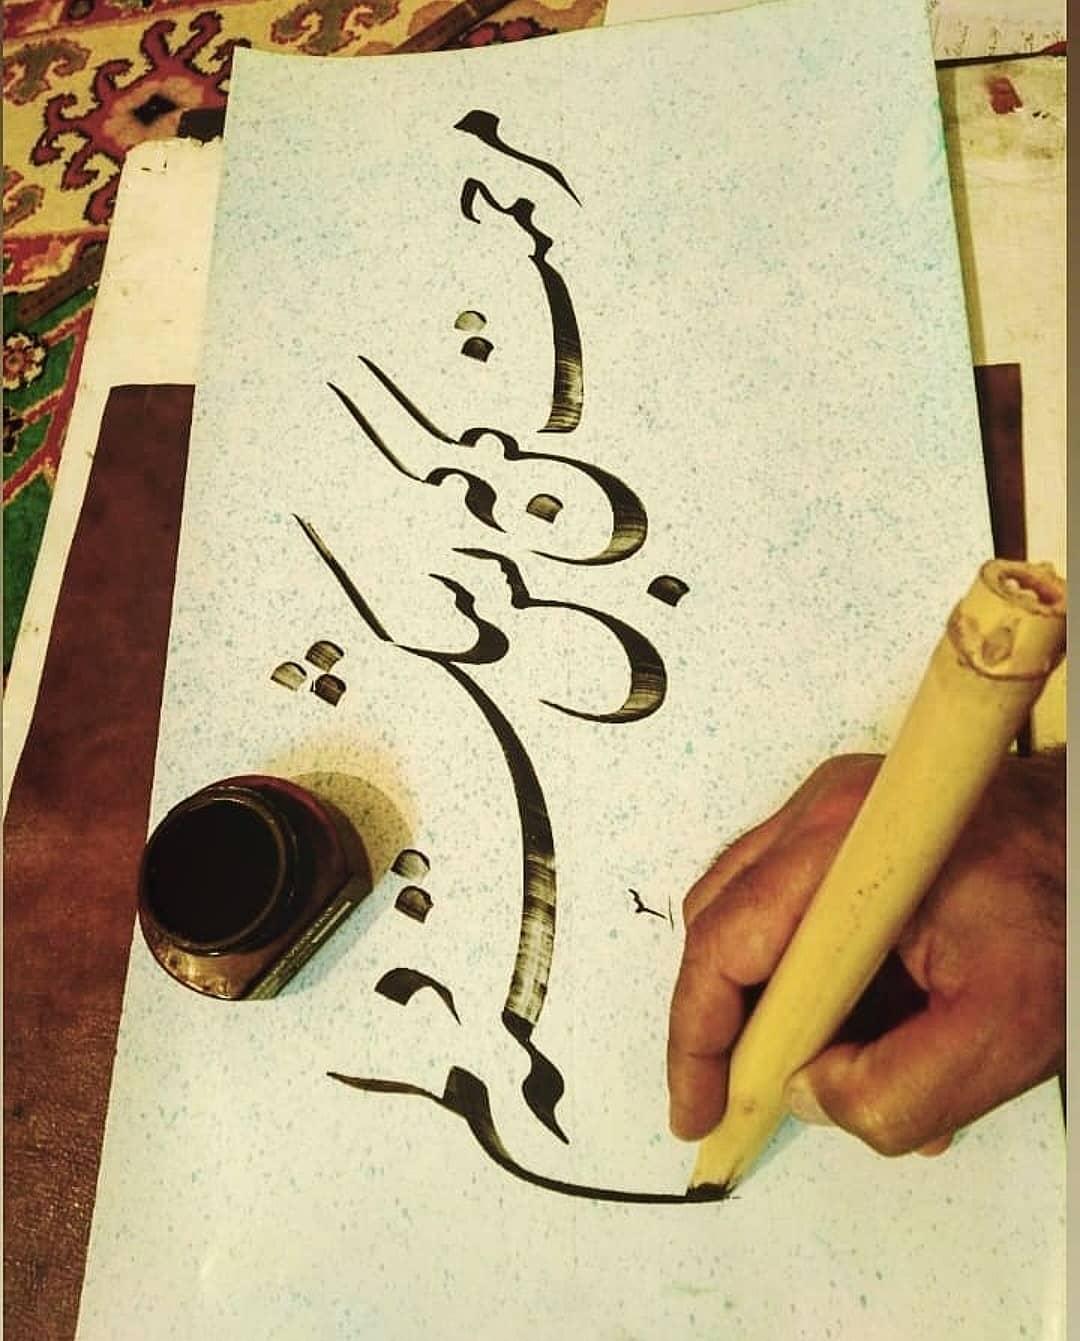 Farisi/Nasta'liq khatestan  ﷽ مرحمت کن که بس شکسته دلم . #خطستان  @khatestan #خط_خودکاری#خط_خودکاری_نوین#خط… 790